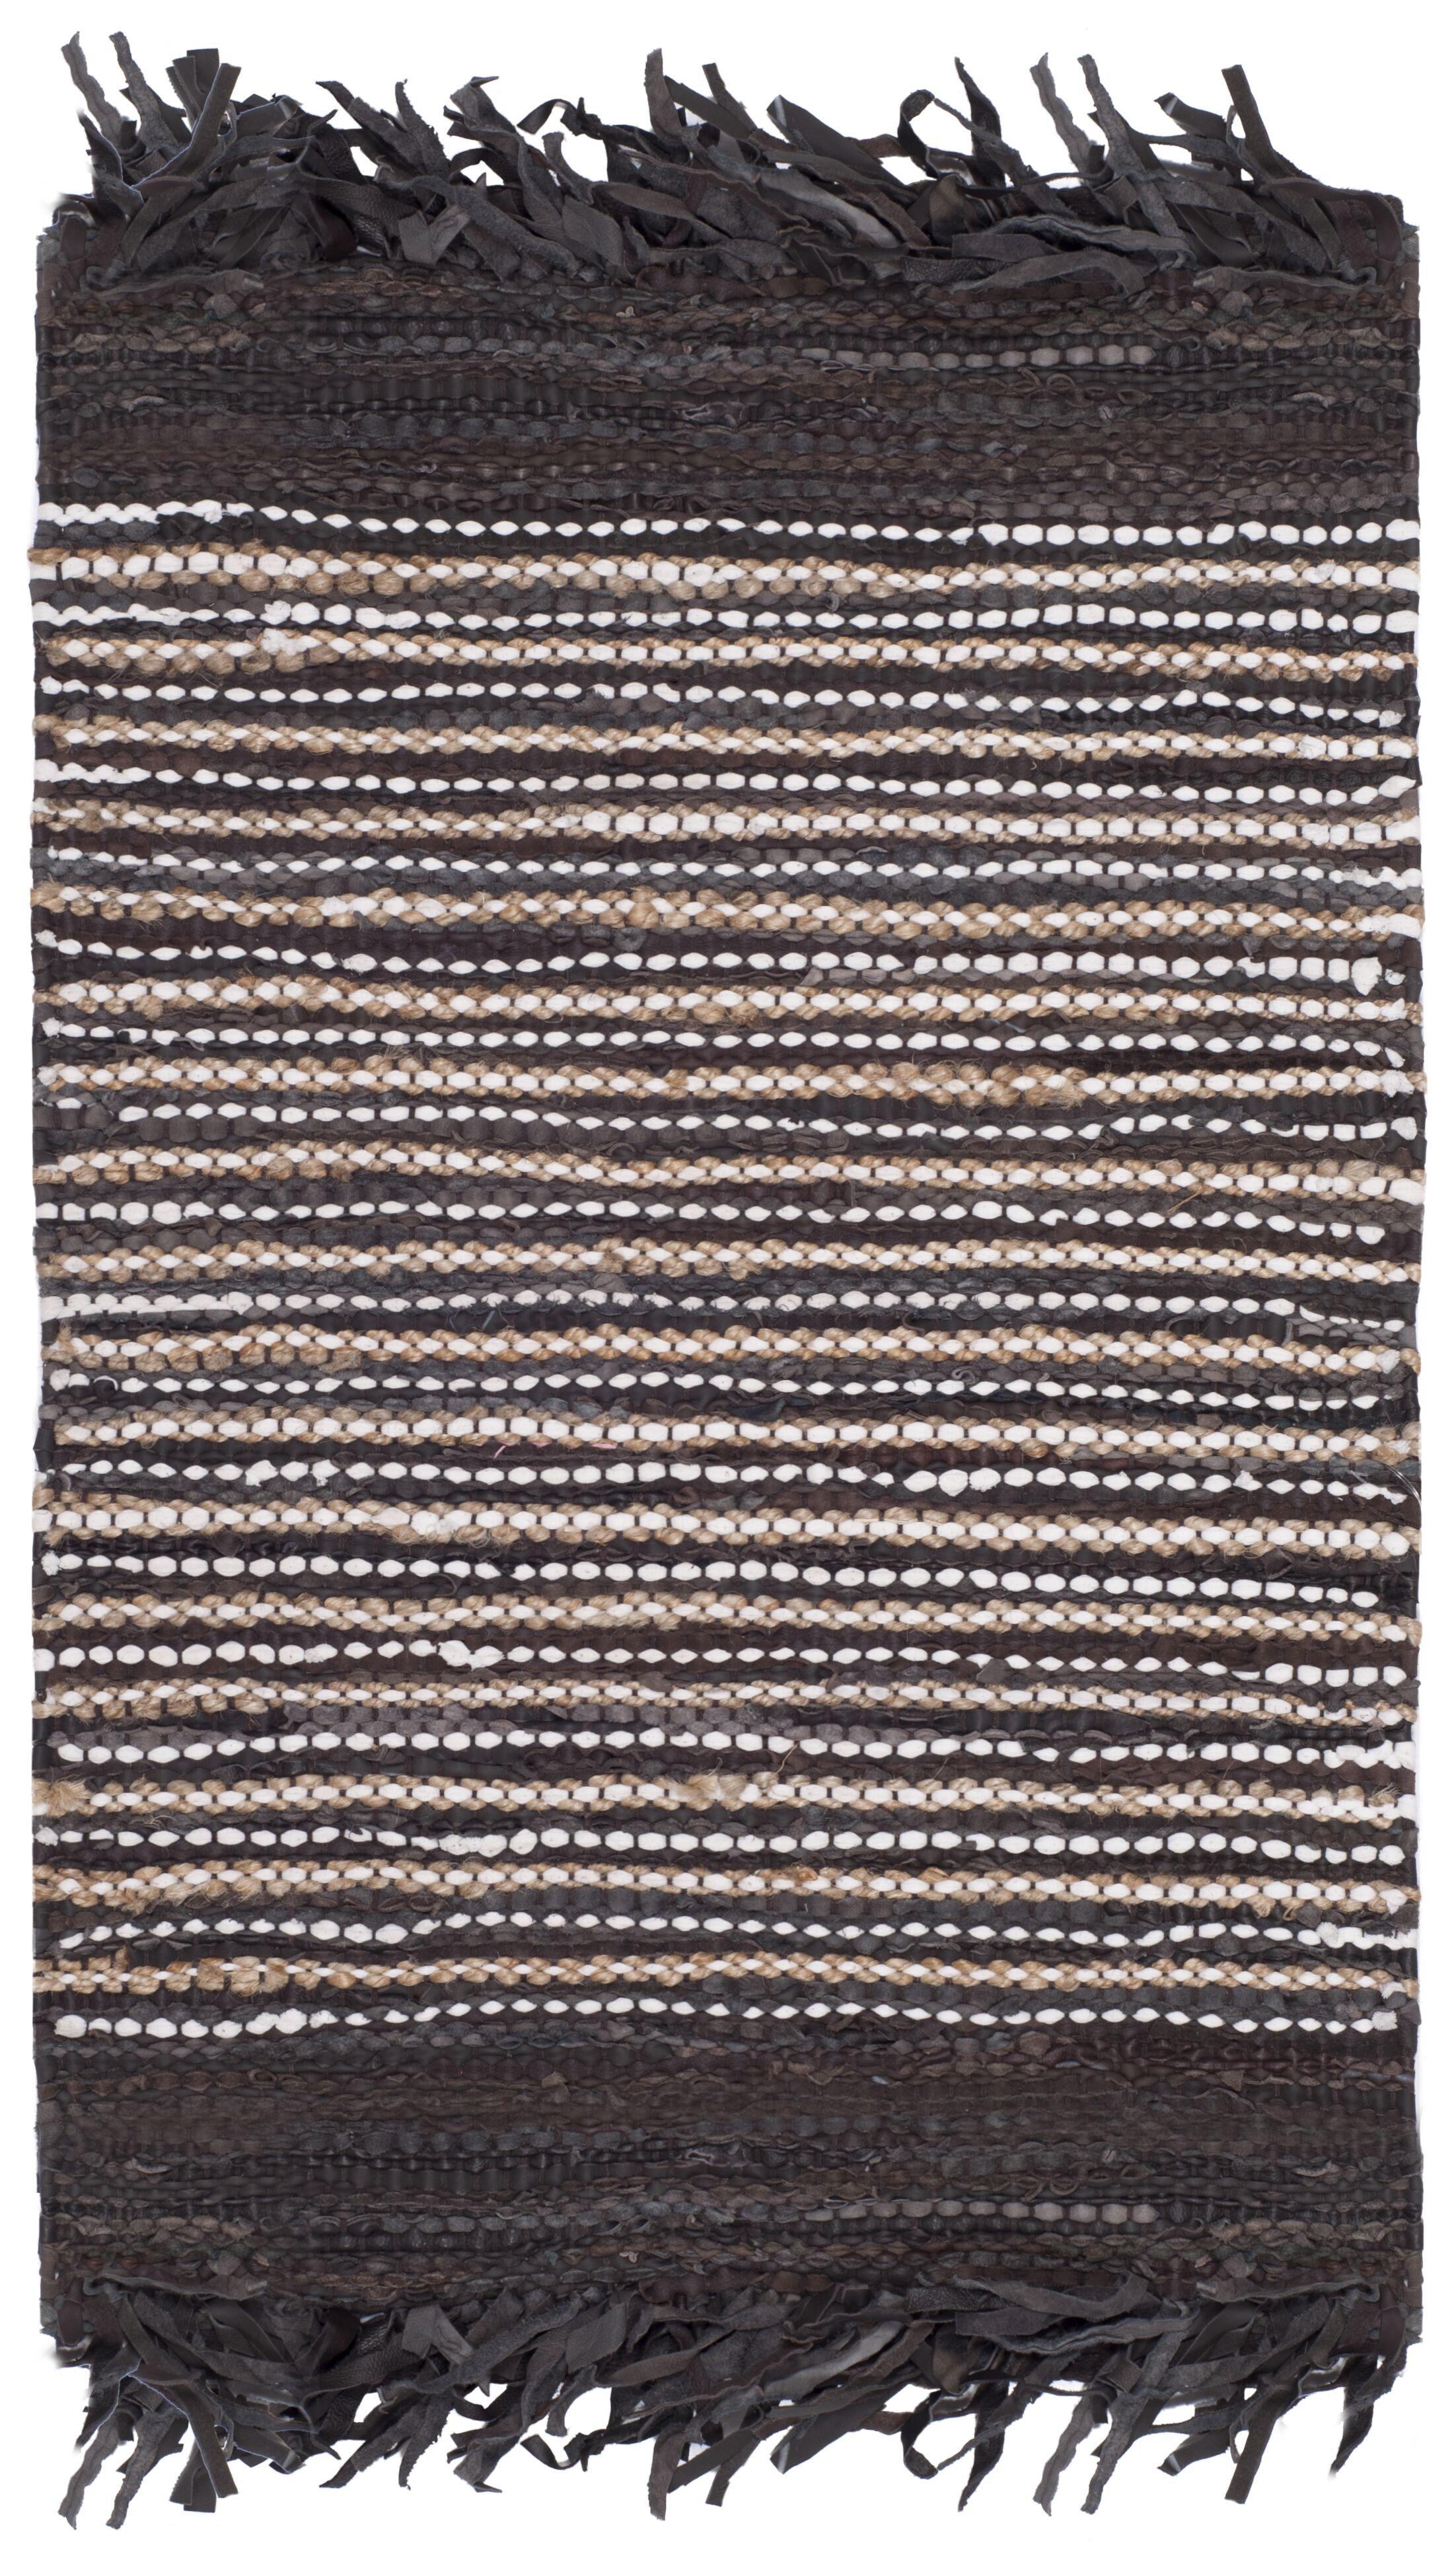 Glostrup Hand Tufted Dark Brown Area Rug Rug Size: Rectangle 6' x 9'